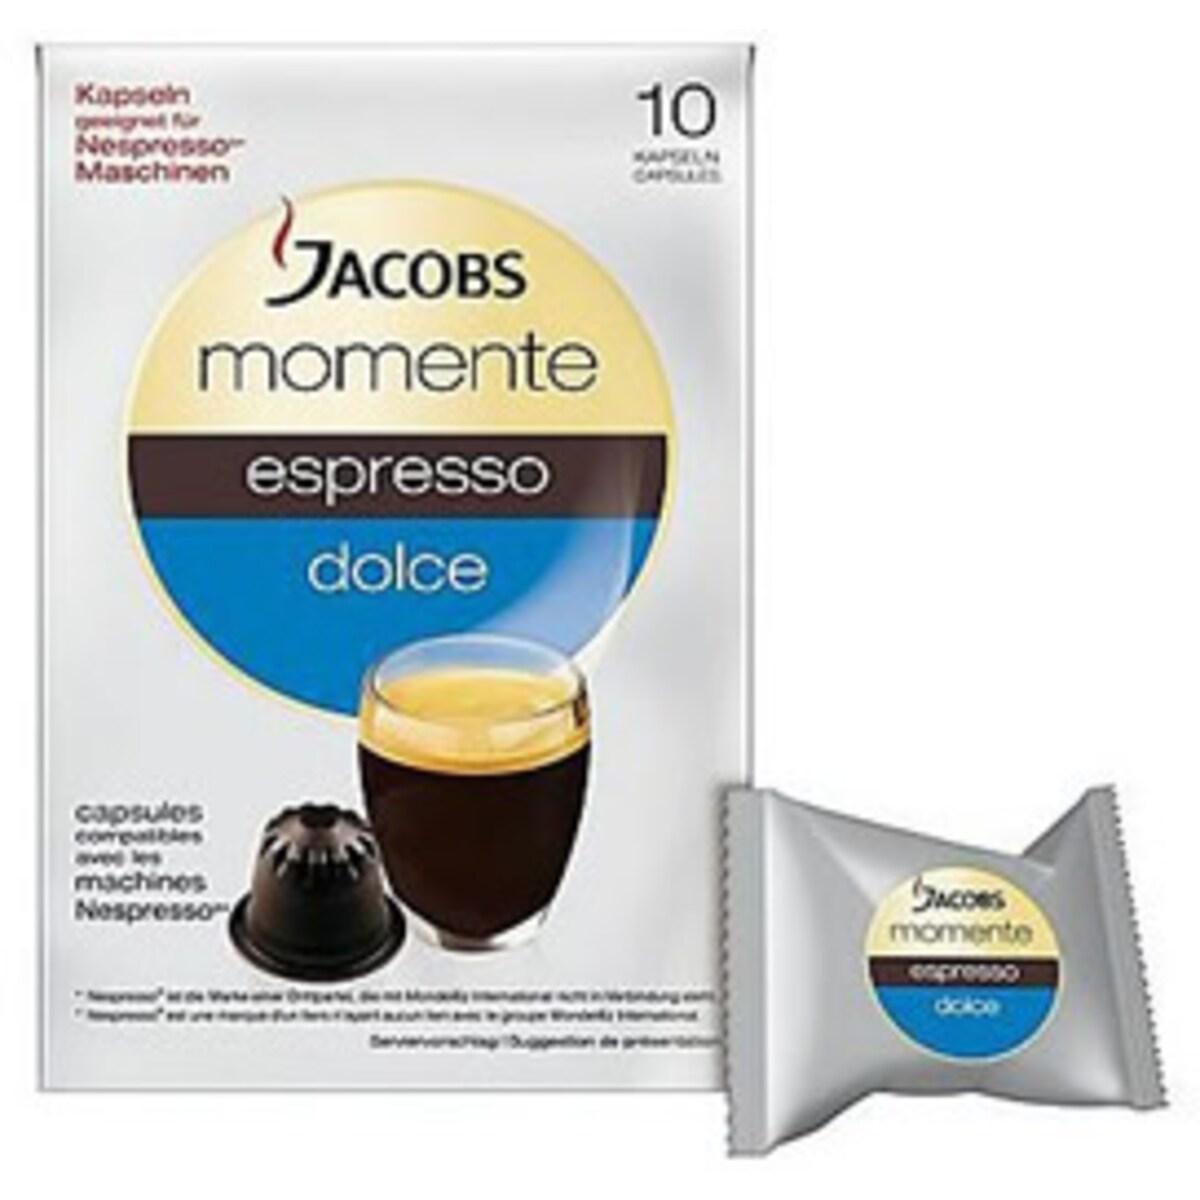 Jacobs Espresso Dolce